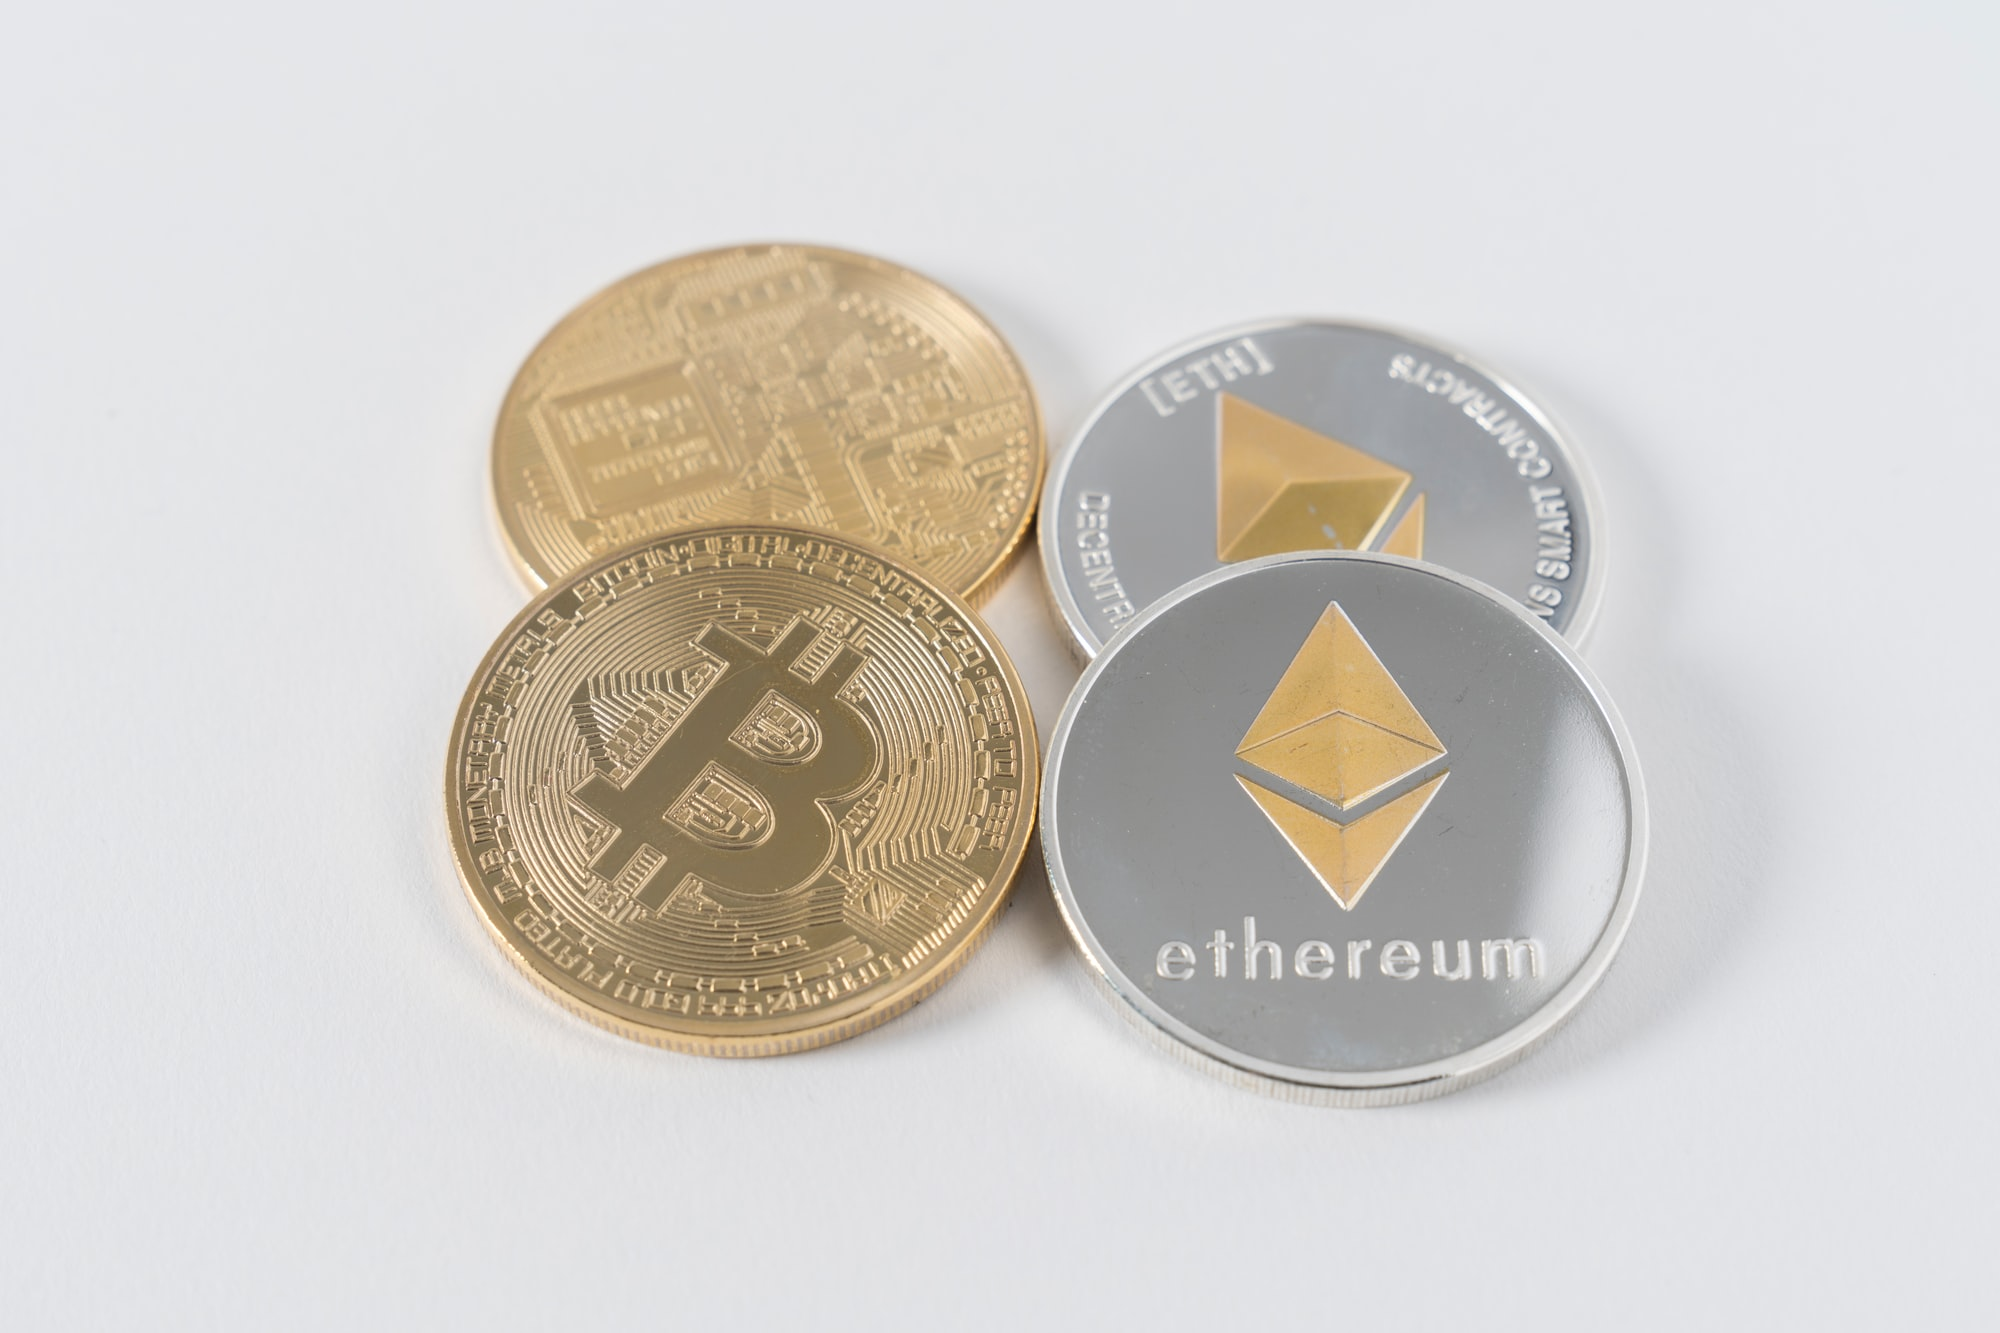 Bitcoin and Ethereum: Relevant Comparison